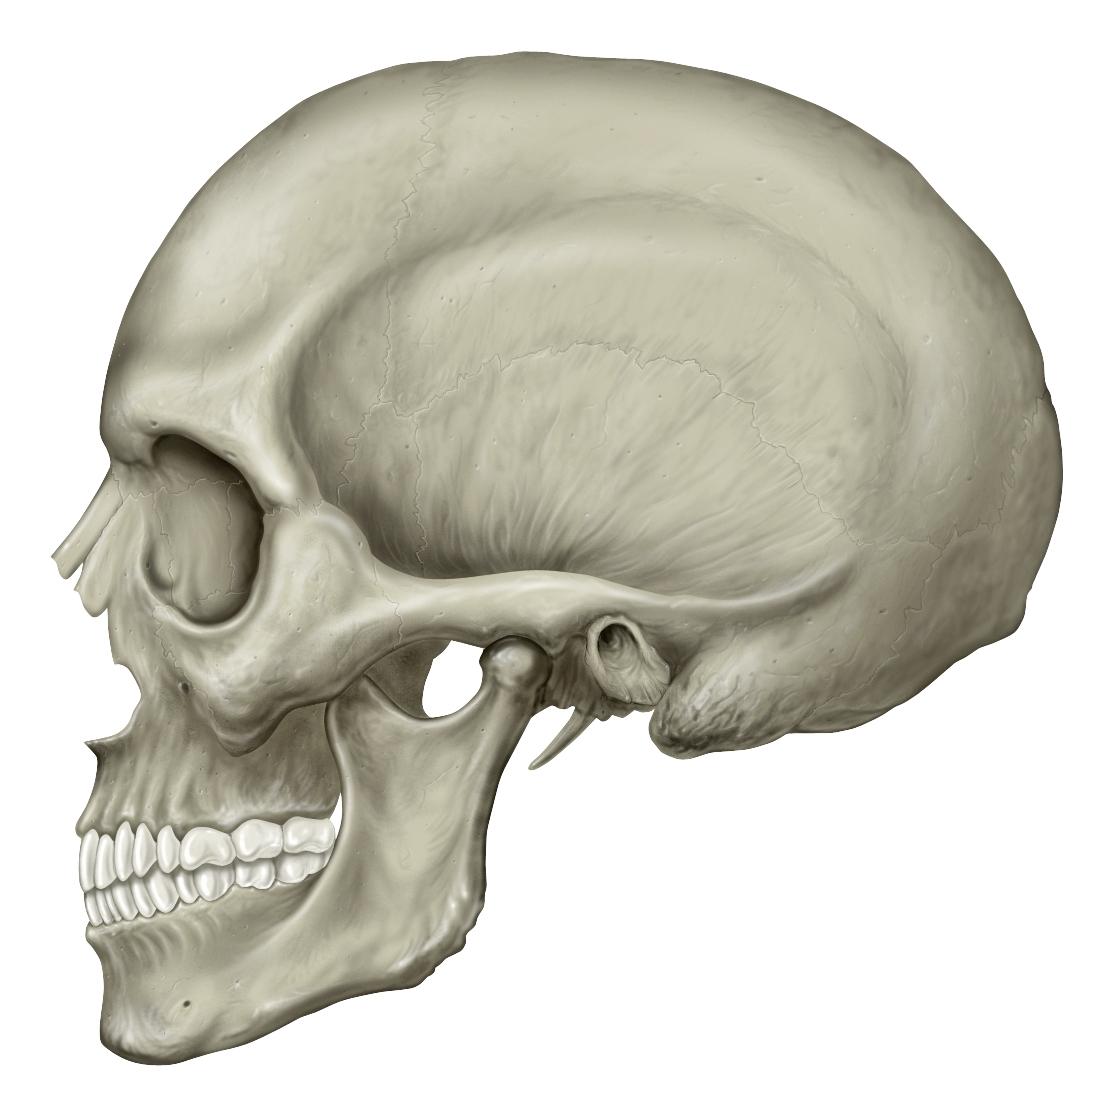 Filehuman Skull Lateral Viewg Wikimedia Commons